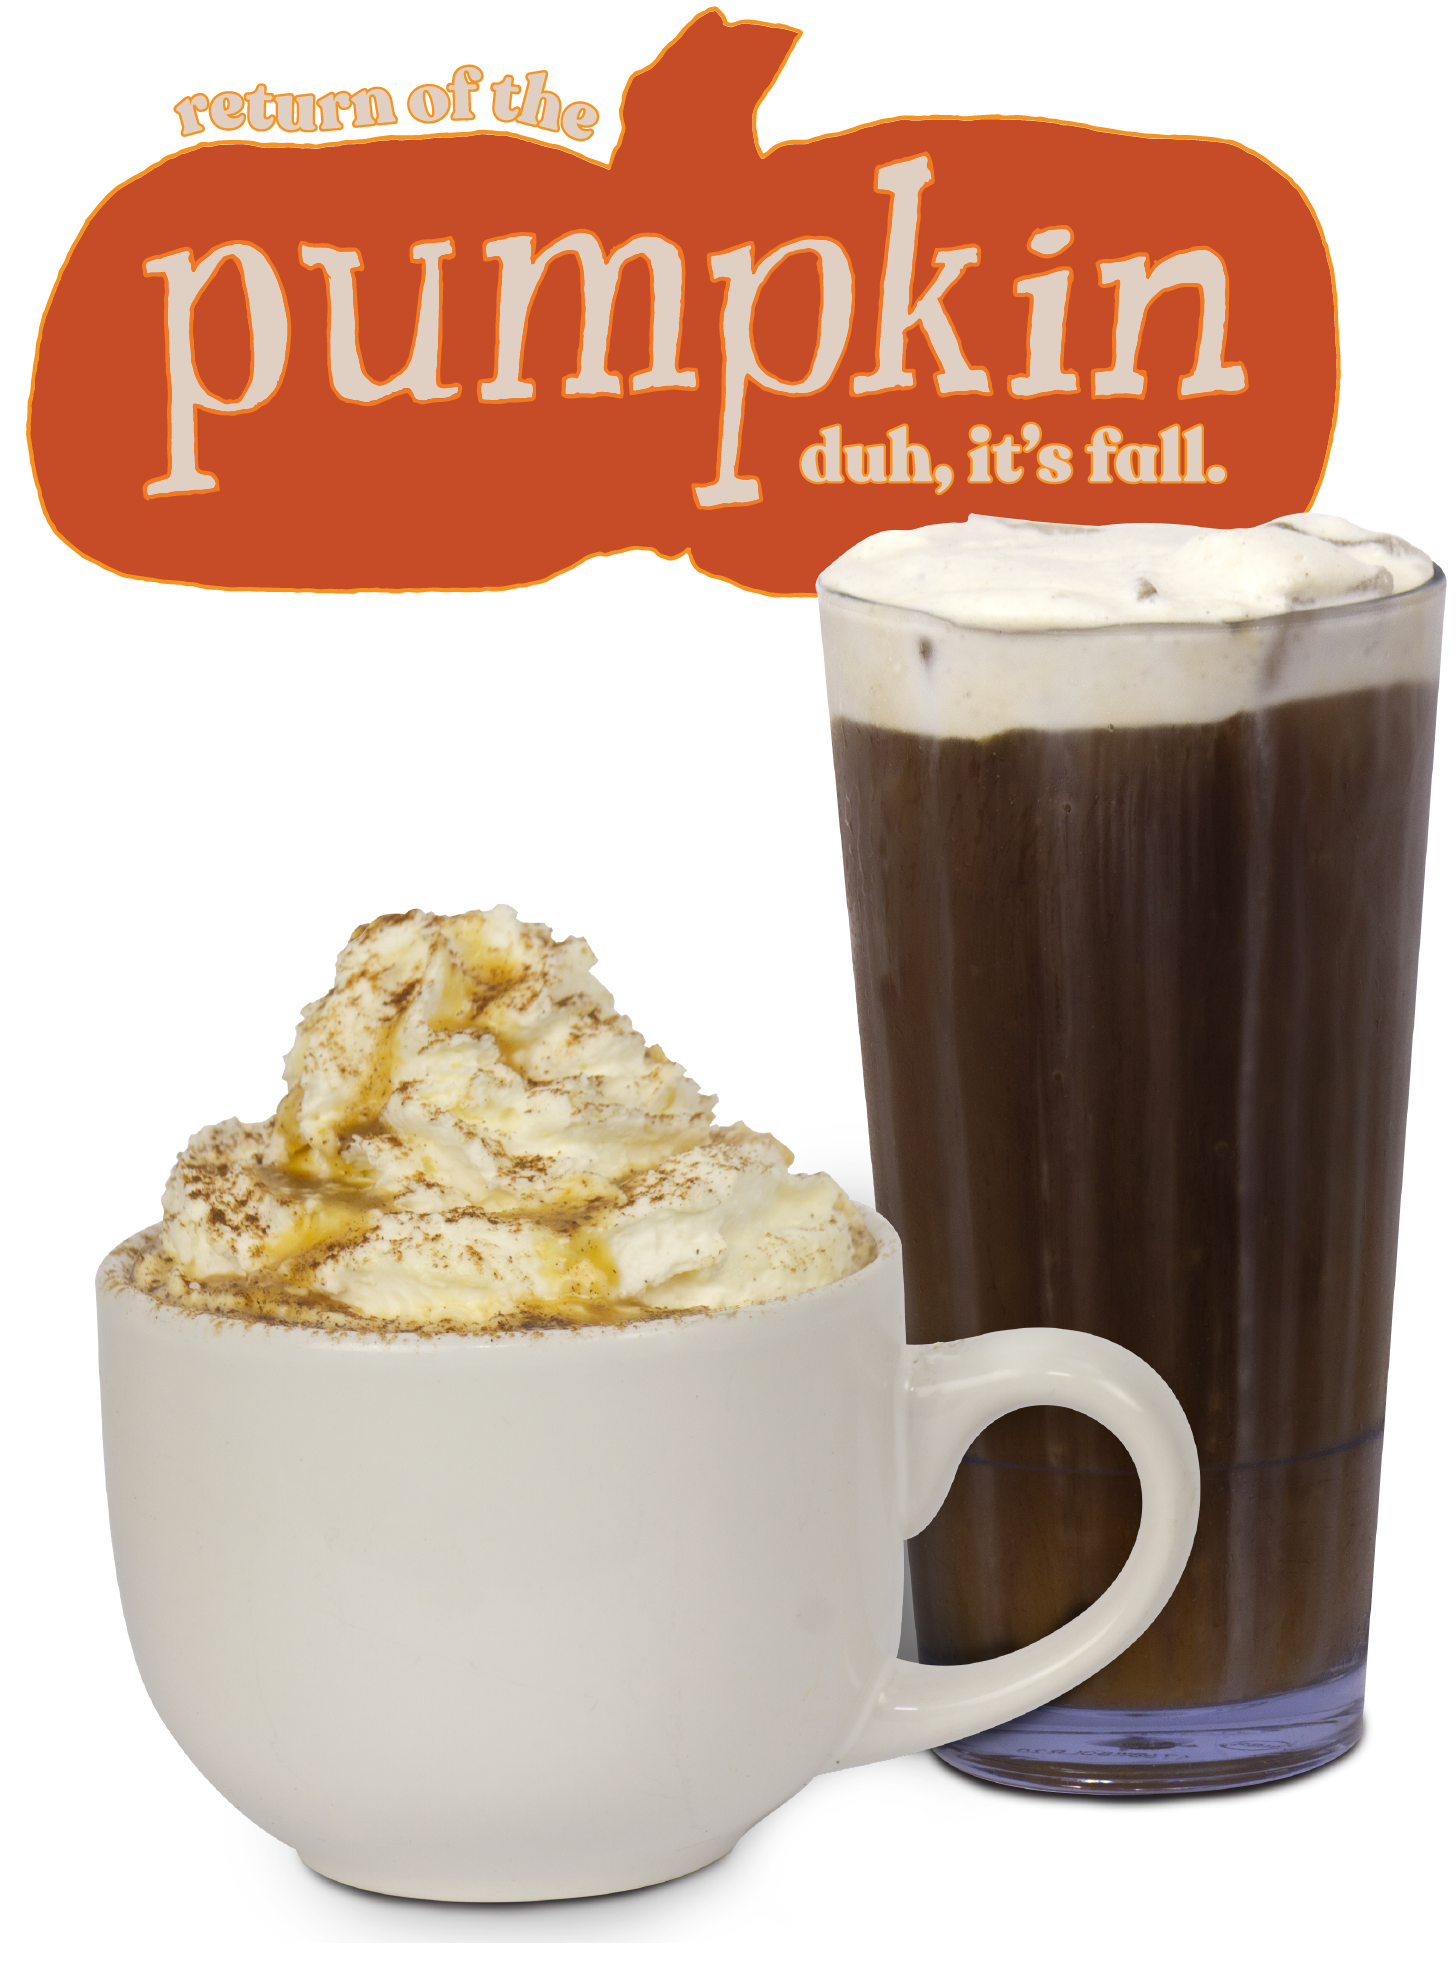 Return of the pumpkin. Duh, it's fall!